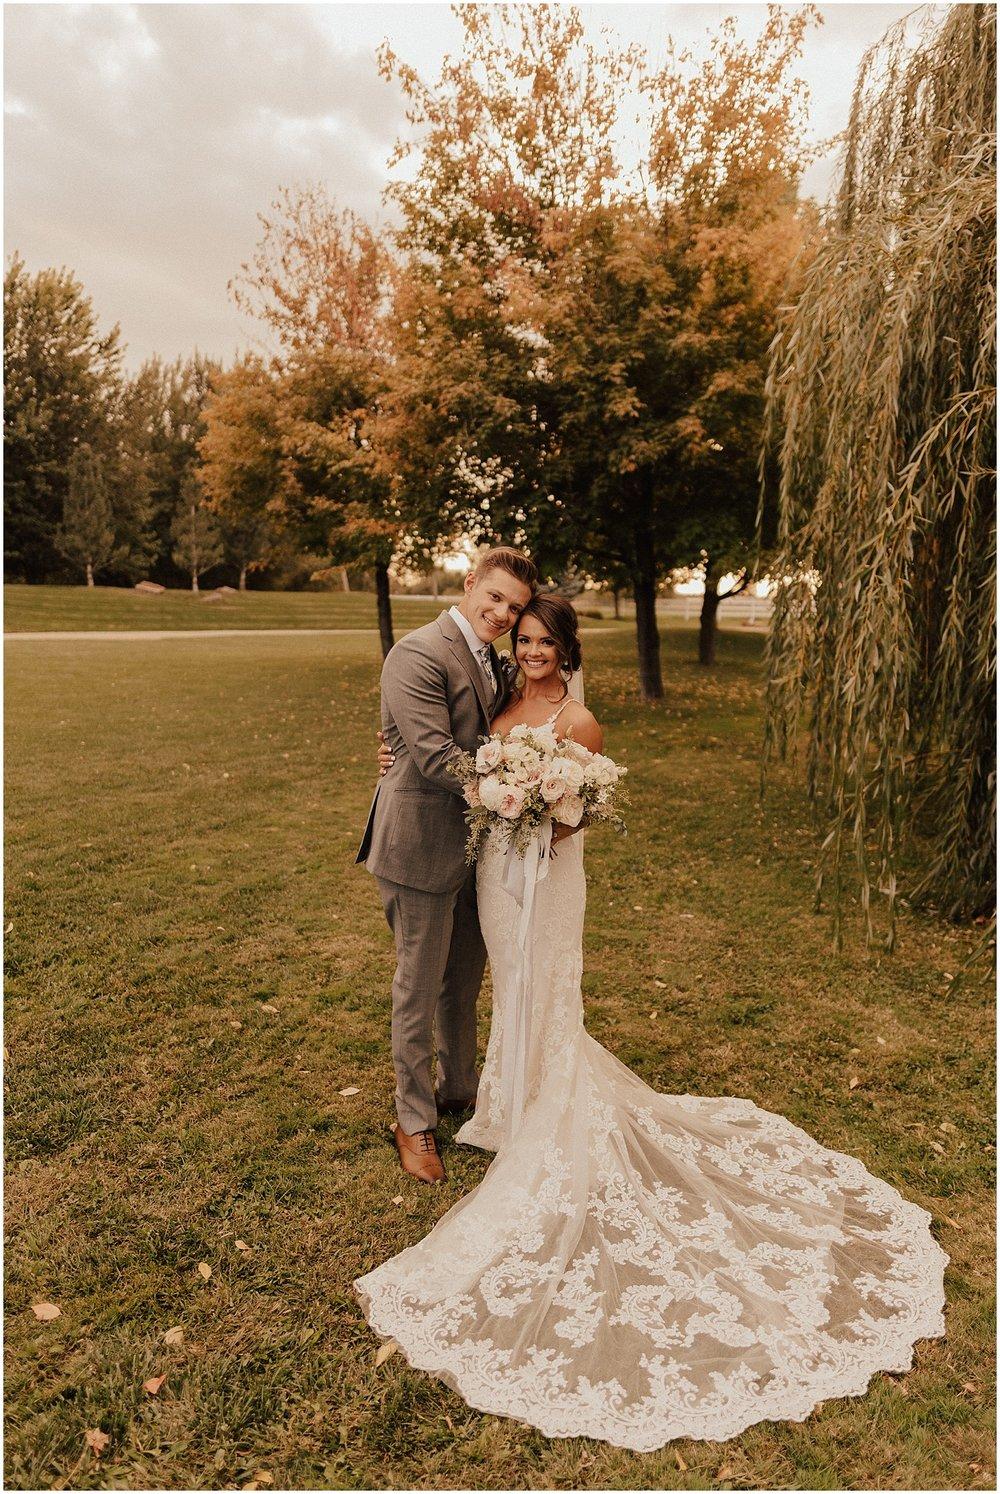 whimsical-summer-wedding-boise-idaho-las-vegas-bride162.jpg